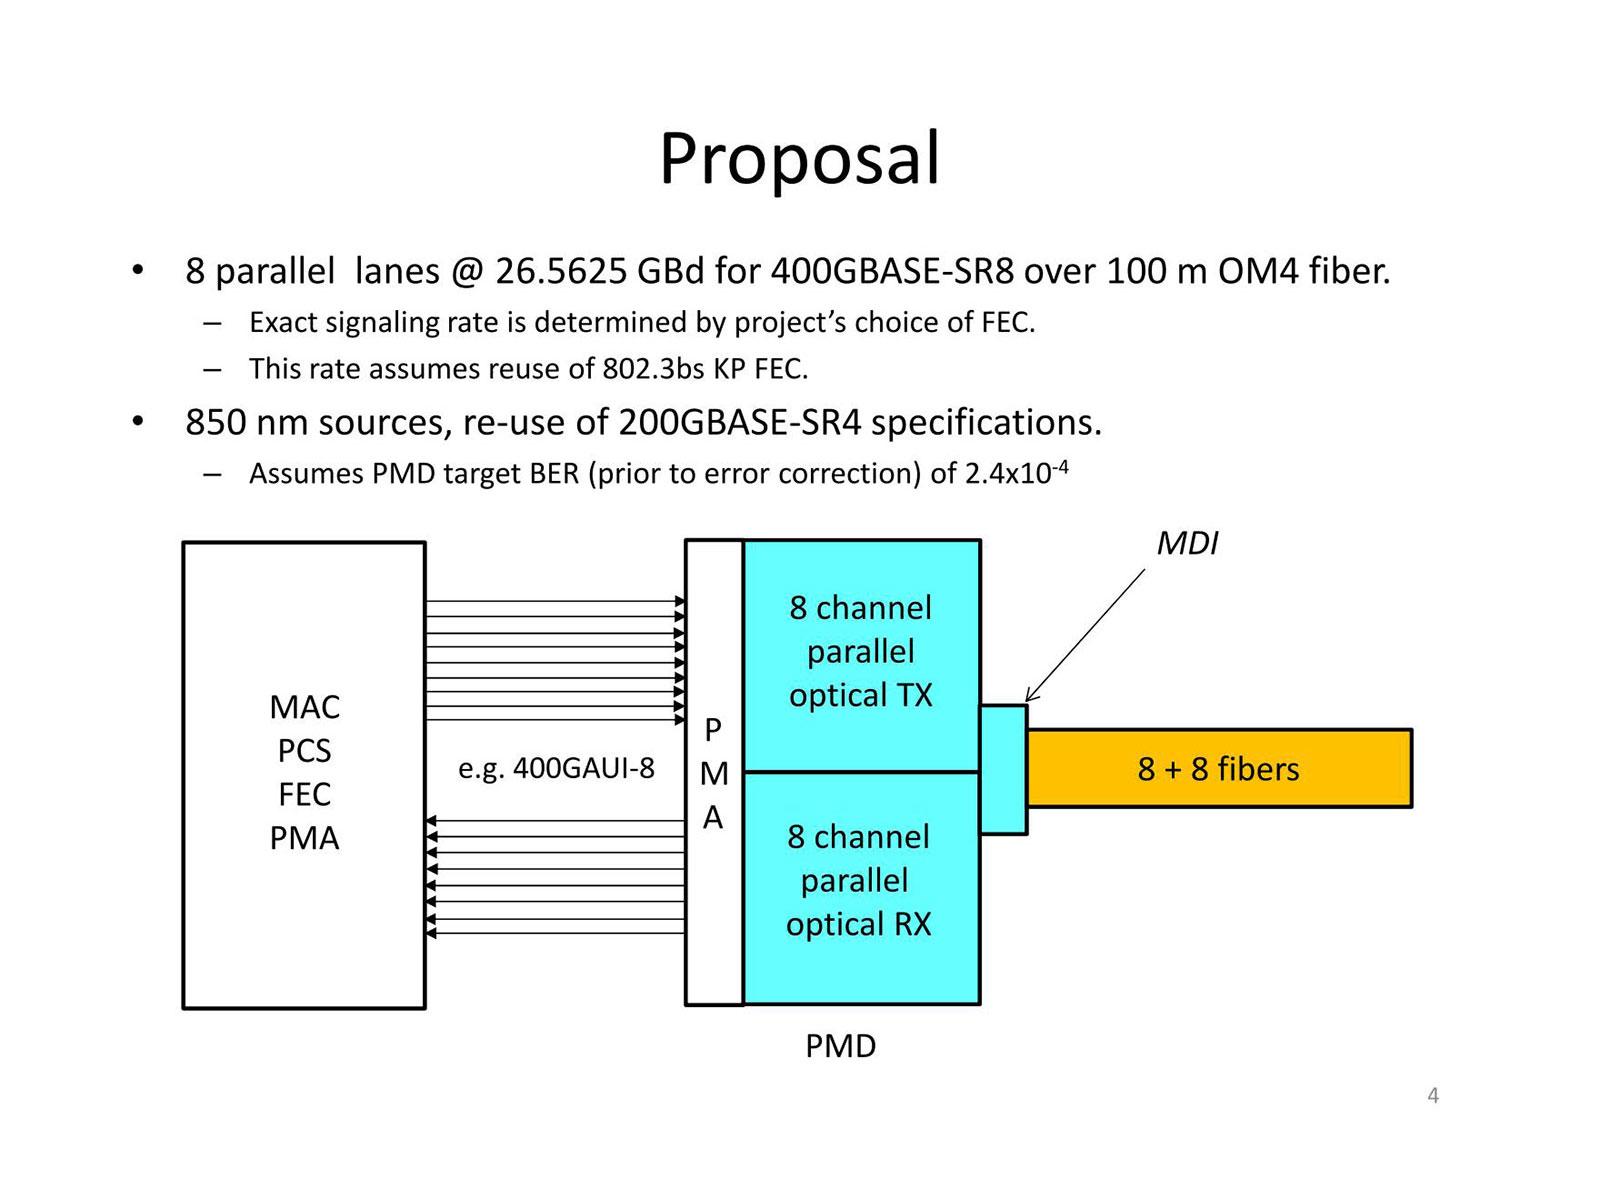 "OM4ファイバーを利用し、400Gbpsを100mの距離まで伝達できることが主目的。出典は""<a href=""https://www.ieee802.org/3/cm/public/May18/king_3cm_01b_0518.pdf"" class=""strong bn"" target=""_blank"">400 Gb/s 100-m 8-pair MMF objective baseline proposal</a>"""